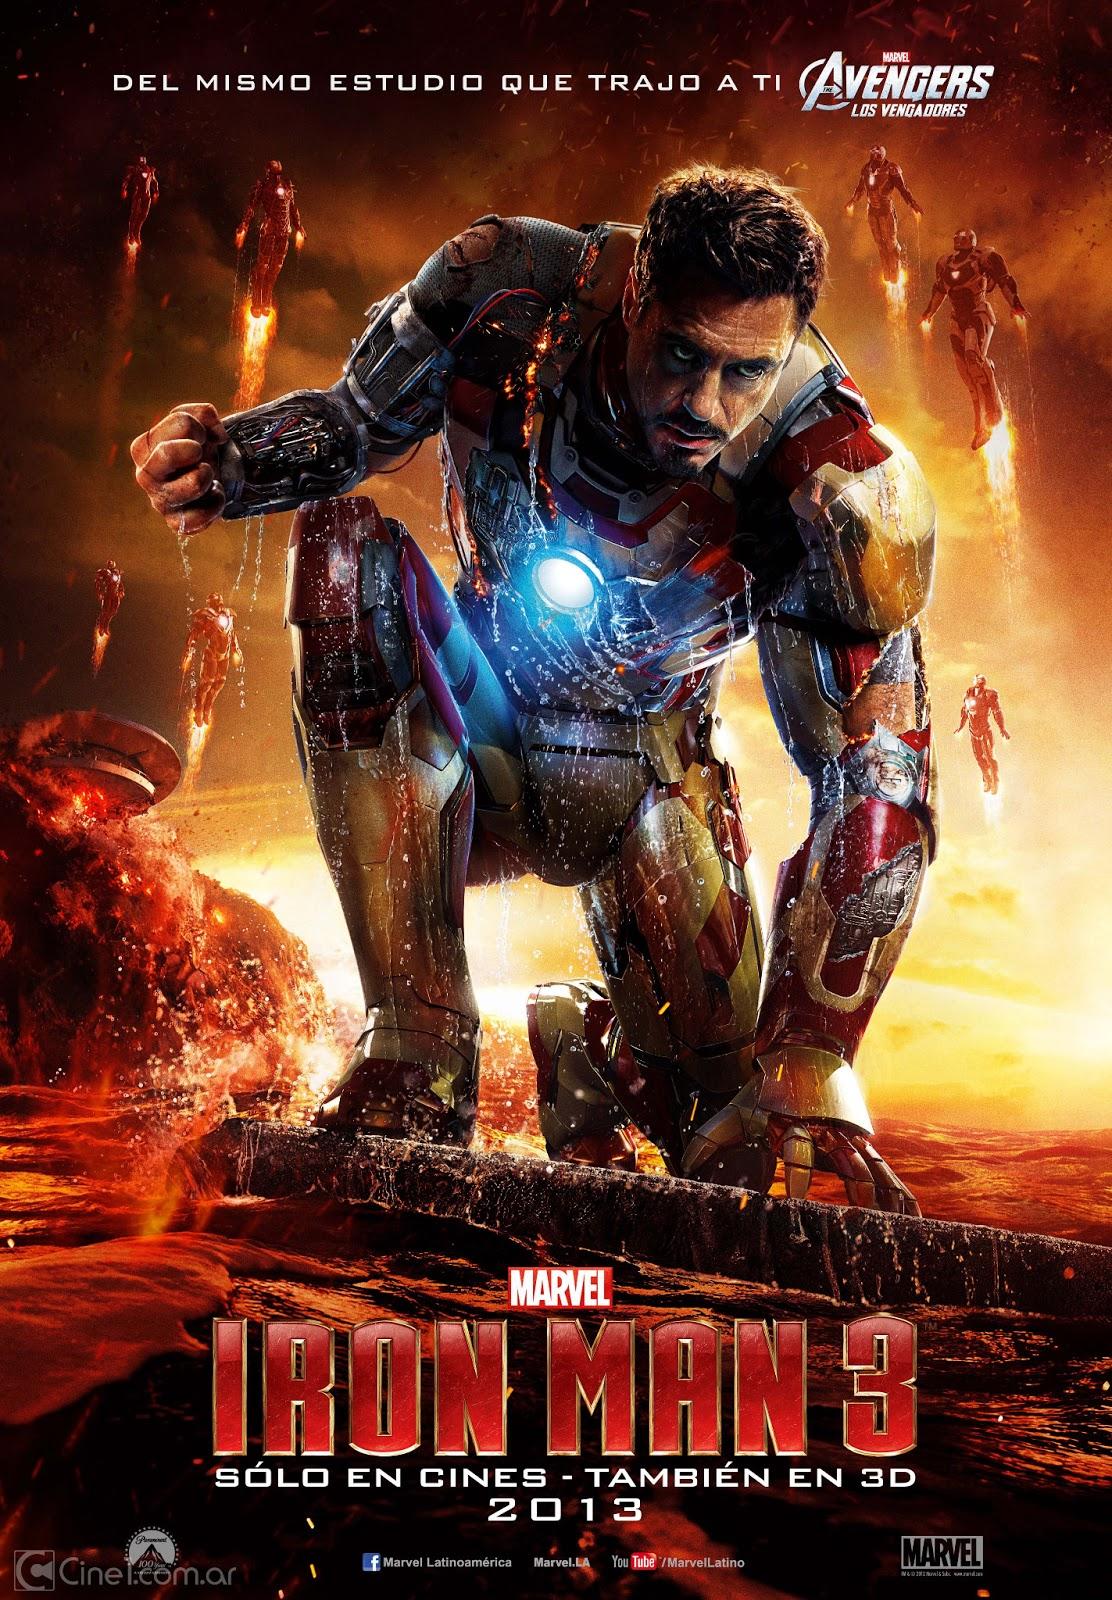 amader movie: iron man-3 full movie hd 720p[dual audio]